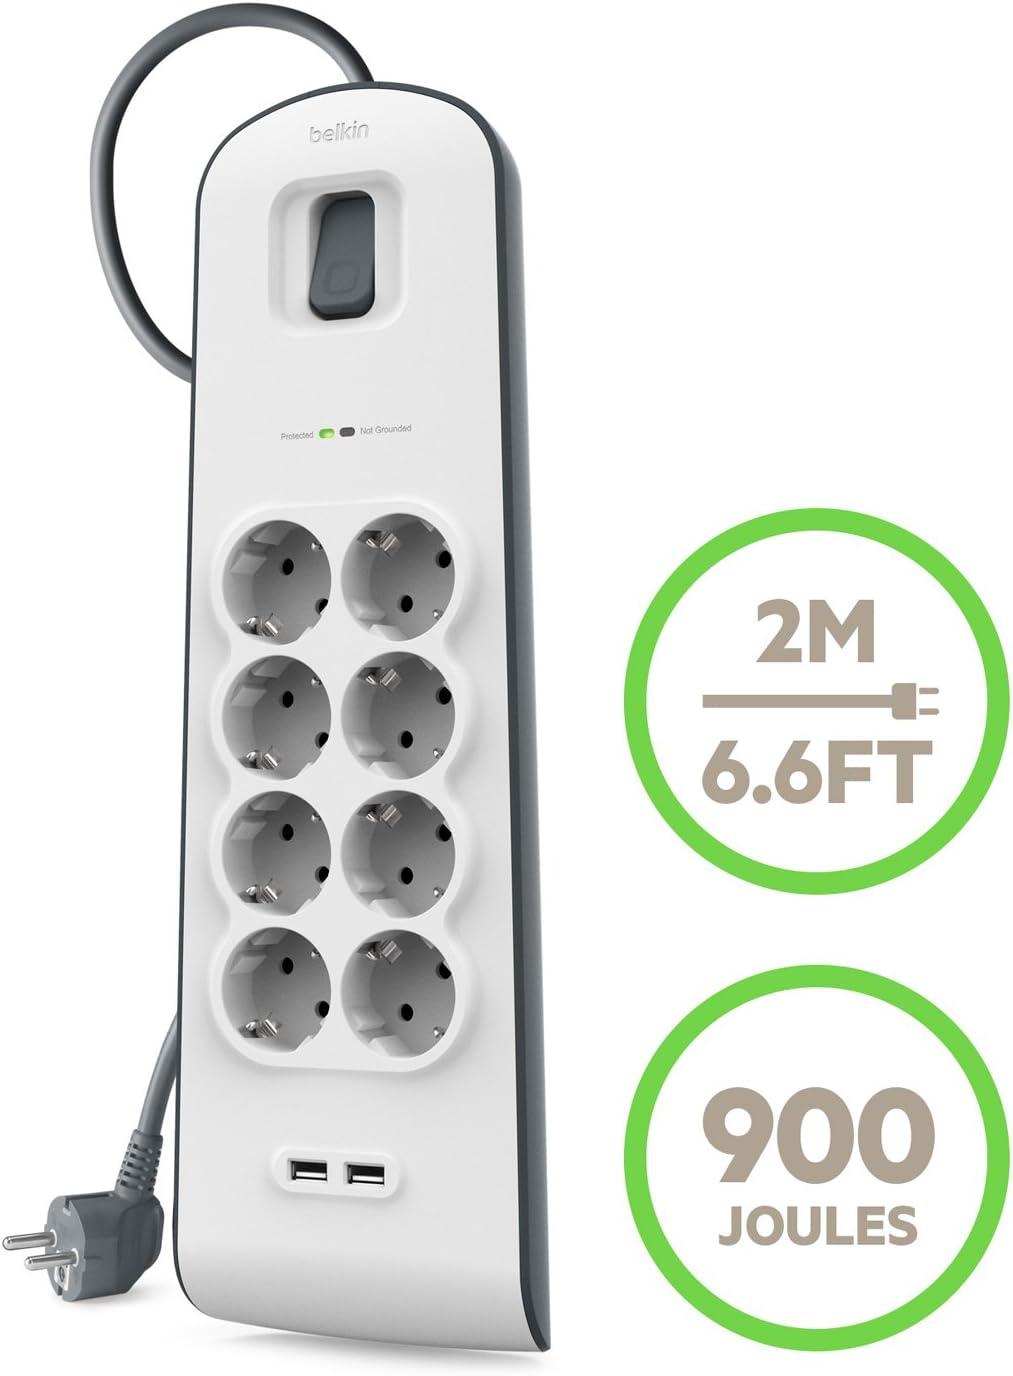 Belkin BSV804VF2M Surge Plus Steckdosenleite 8-fach mit 2 USB 2,4A weiß//grau 2m